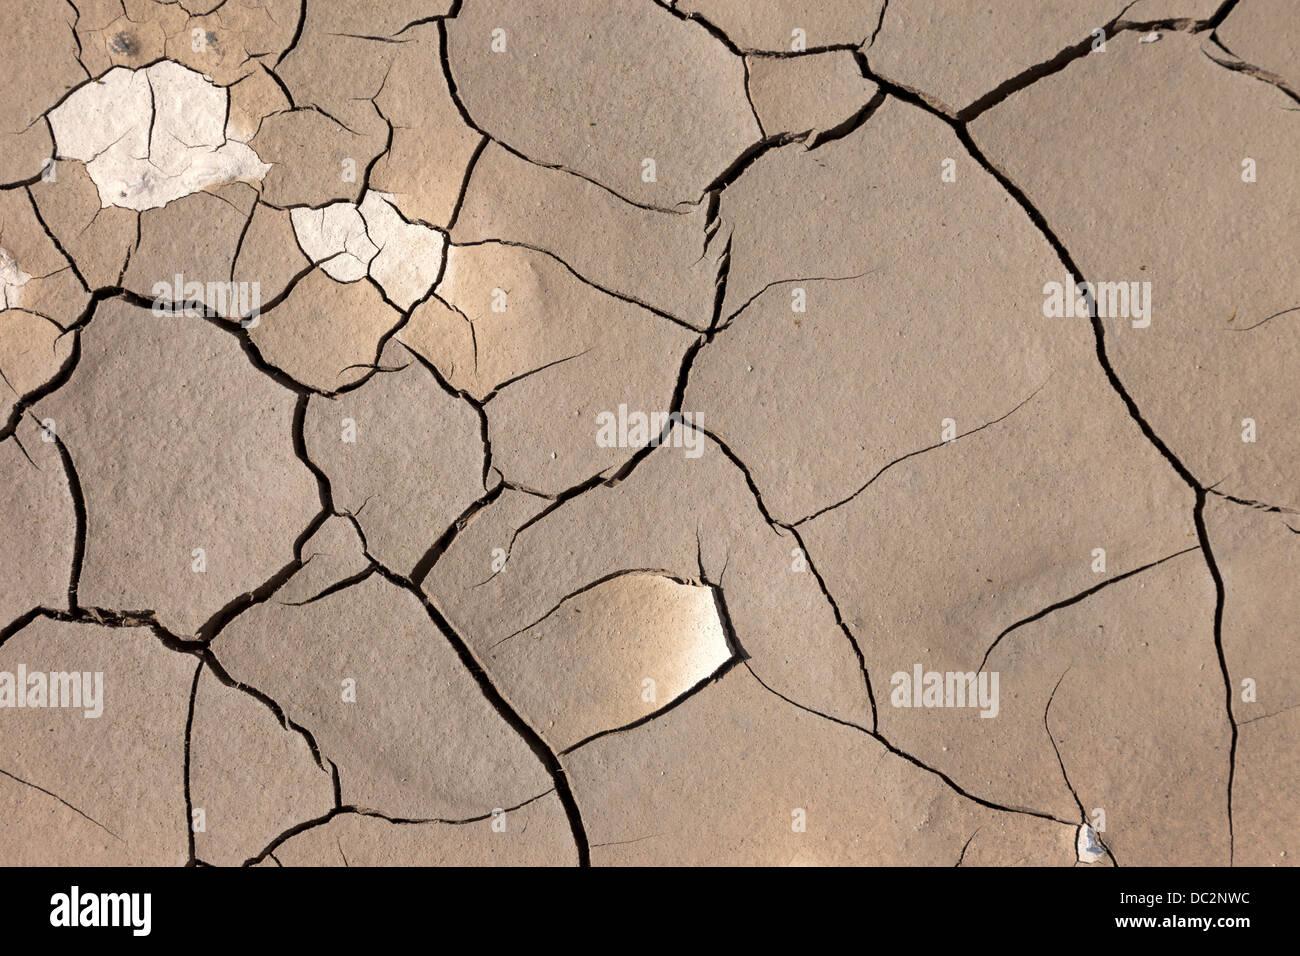 Cracked Mud Pattern - Stock Image